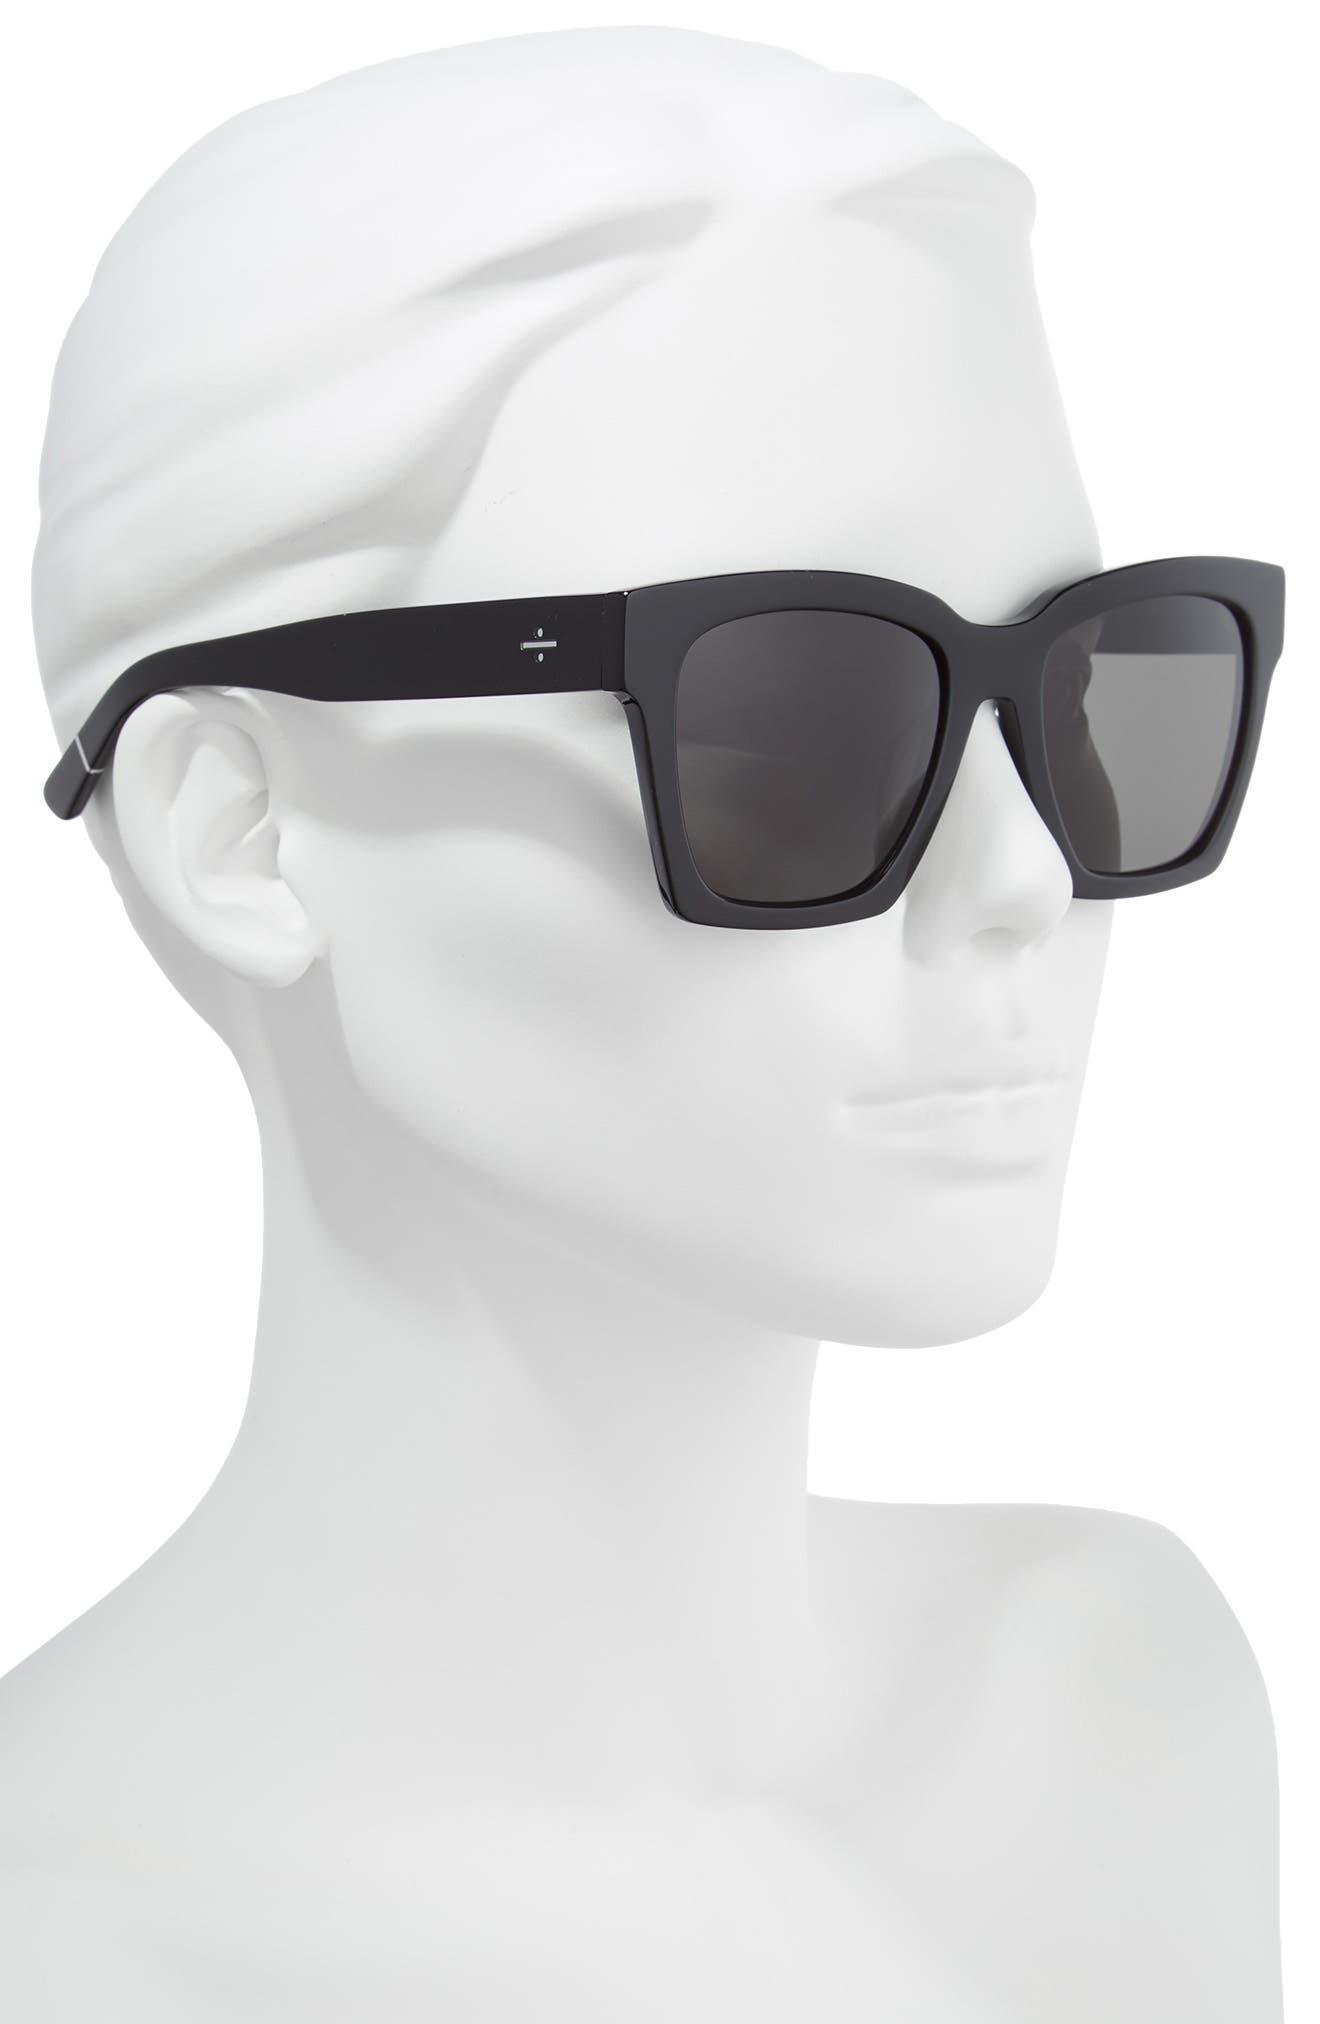 BLANC & ECLARE New York 54mm Polarized Sunglasses,                             Alternate thumbnail 2, color,                             BLACK